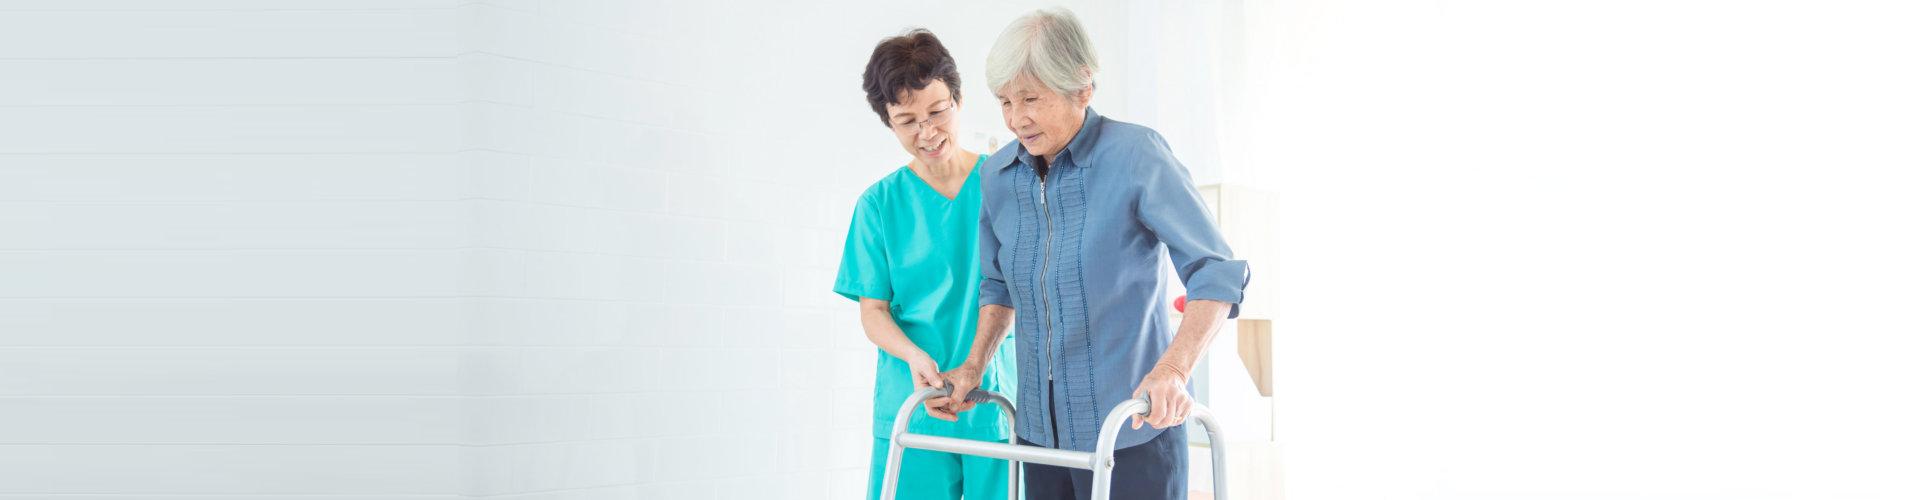 caregiver assisting senior woman walking using her walking frame